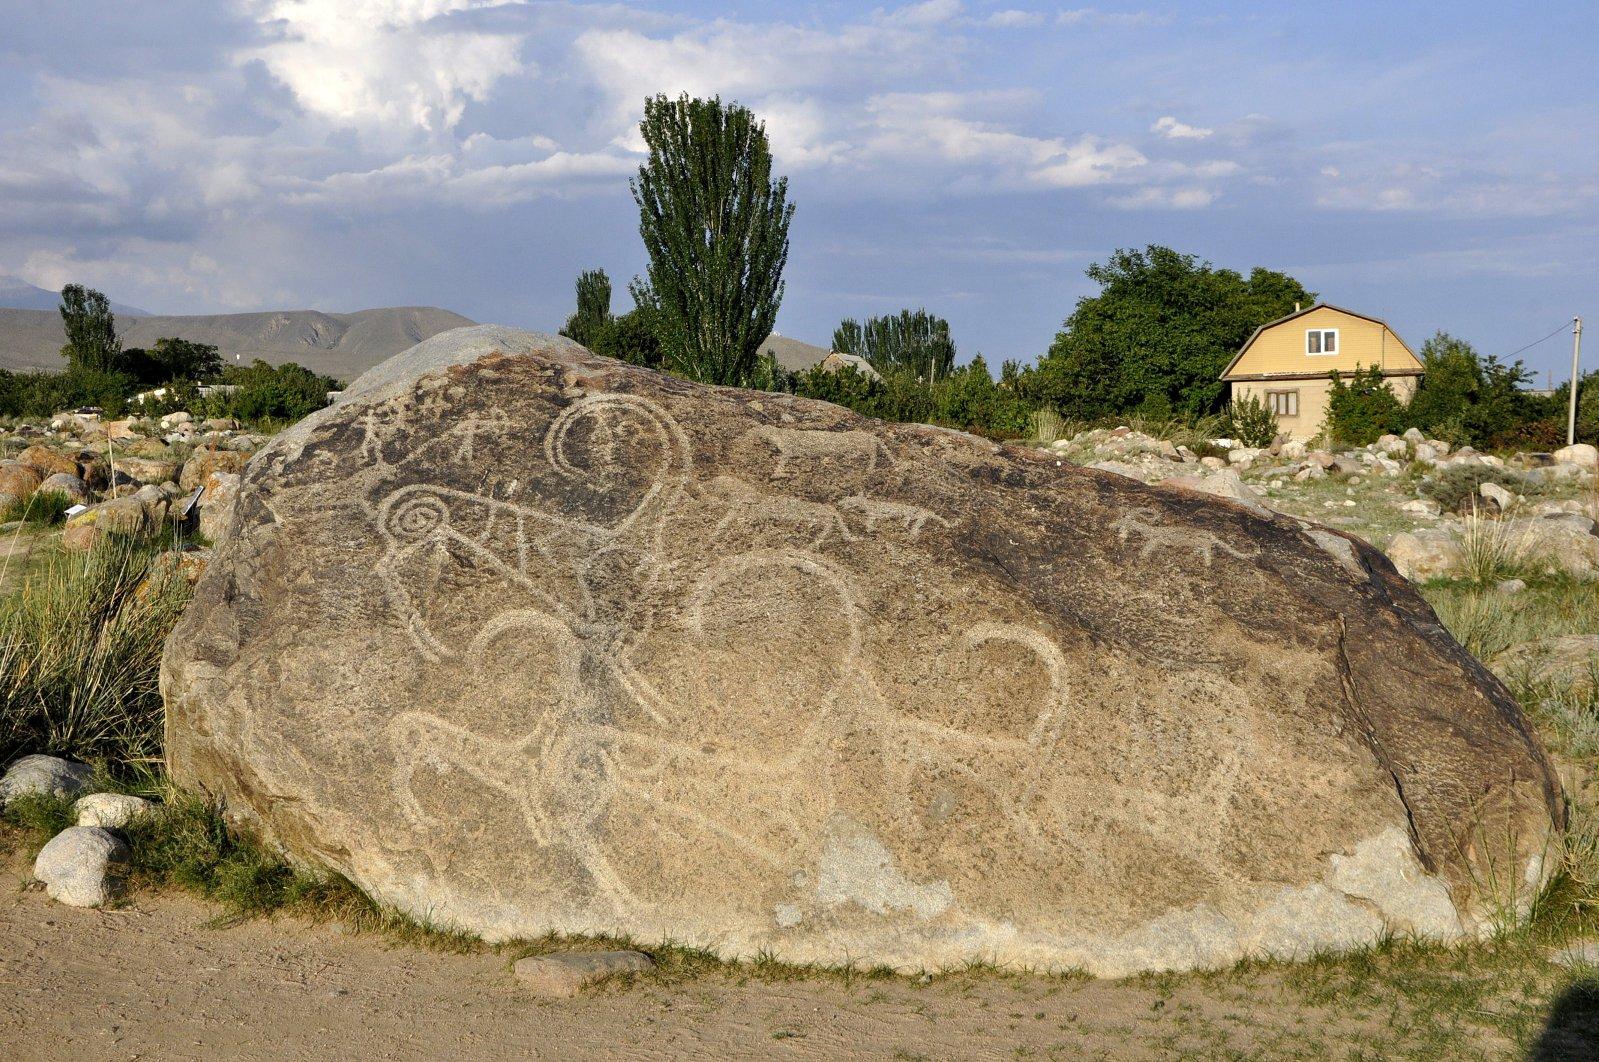 A petroglyph in the Petroglyph Open Air Museum, Cholpon-Ata, Kyrgyzstan, Aug. 22, 2021. (AA Photo)